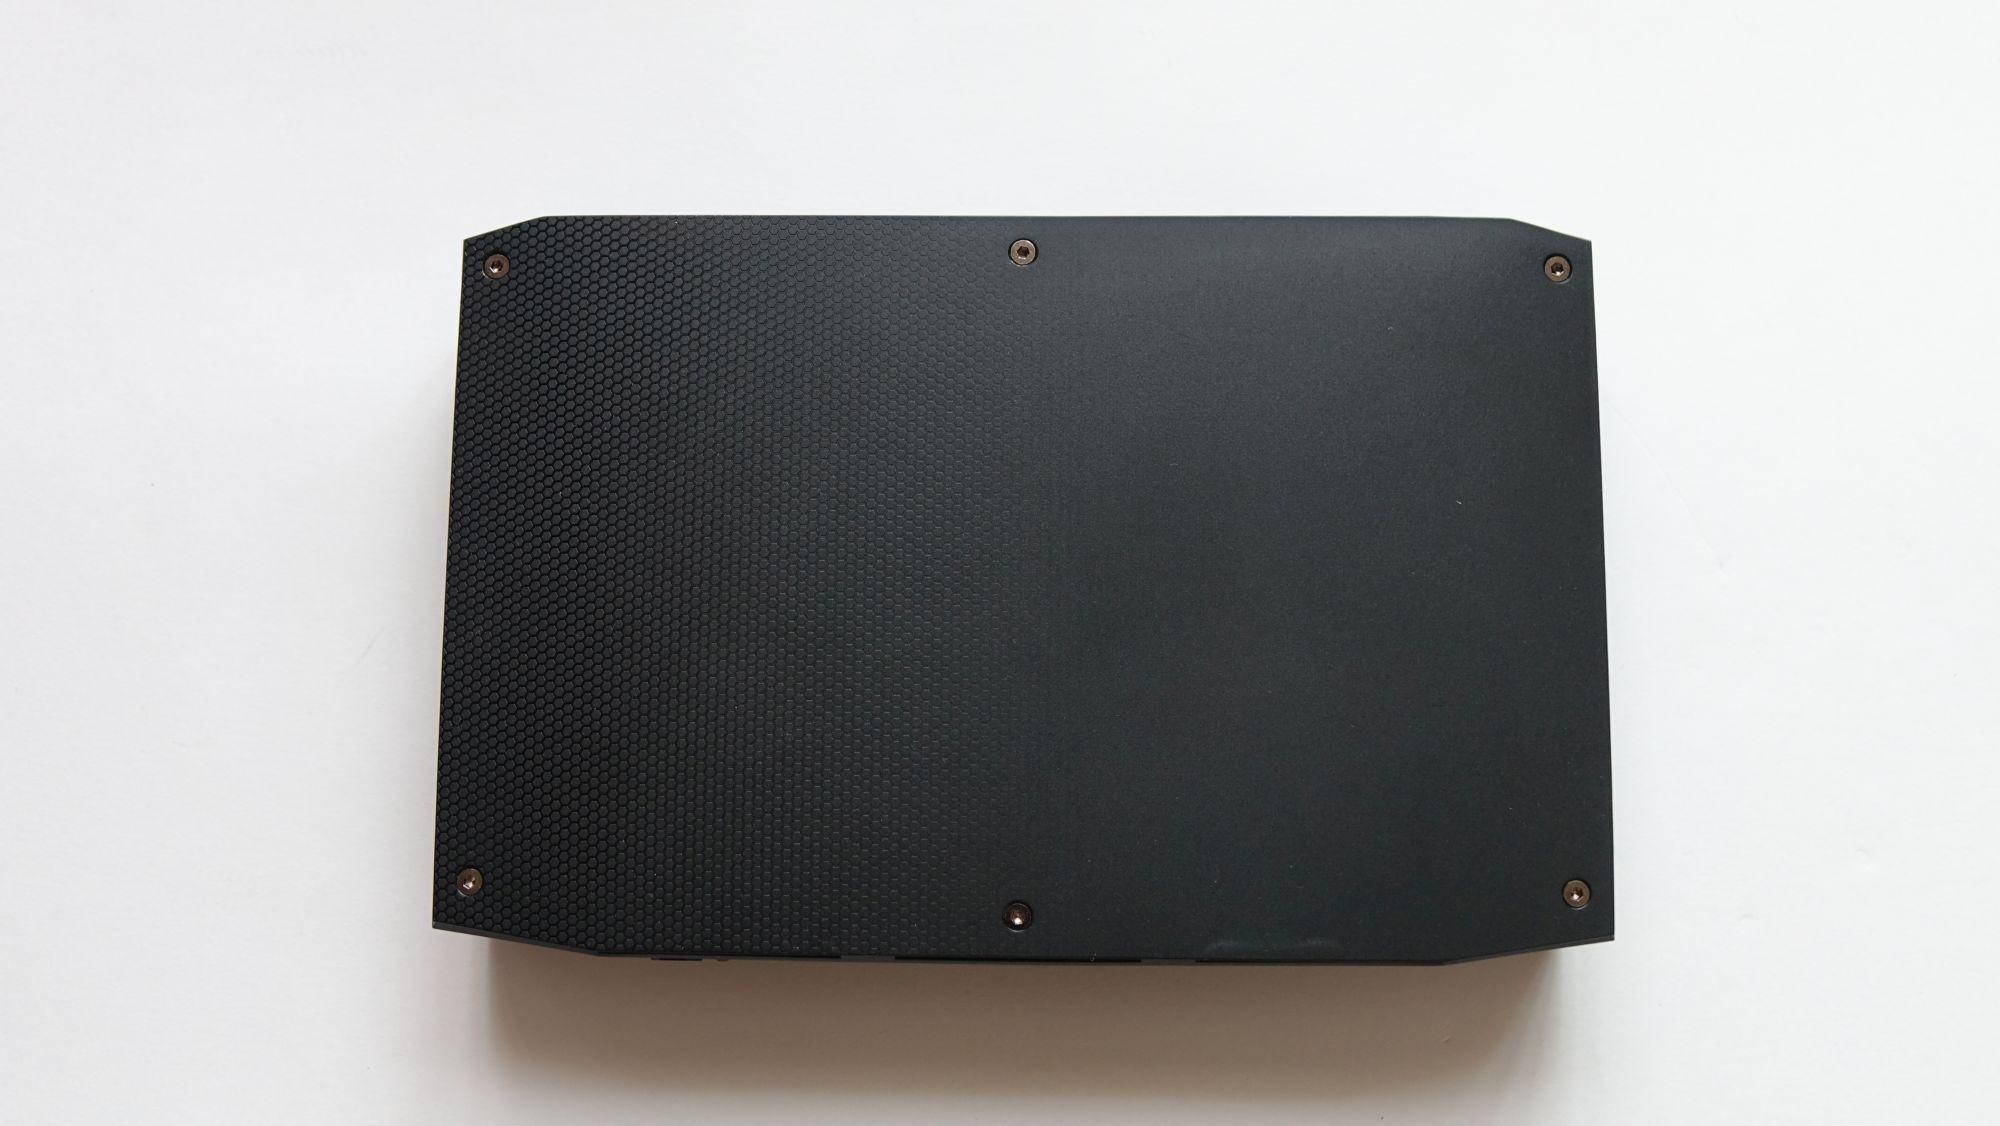 Intel NUC8i7HVK крышка